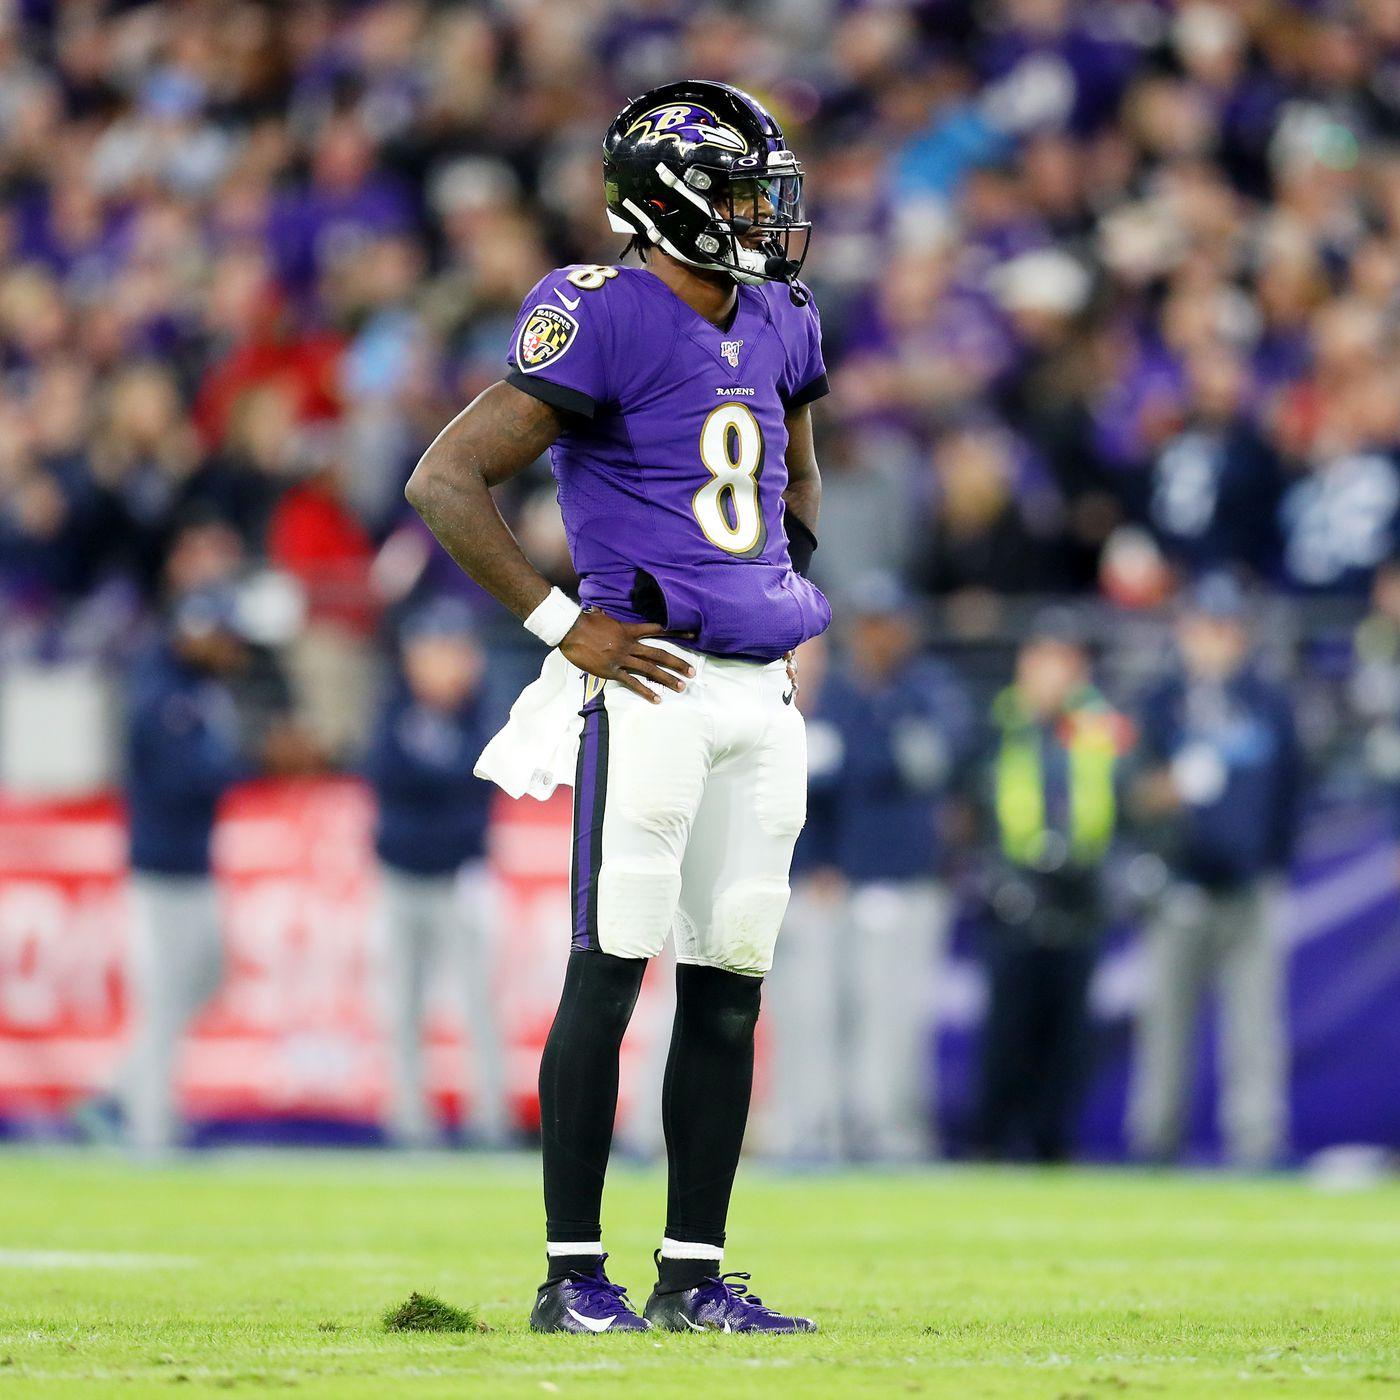 In wild card round, Lamar Jackson revamps season finisher account as Ravens beat Titans